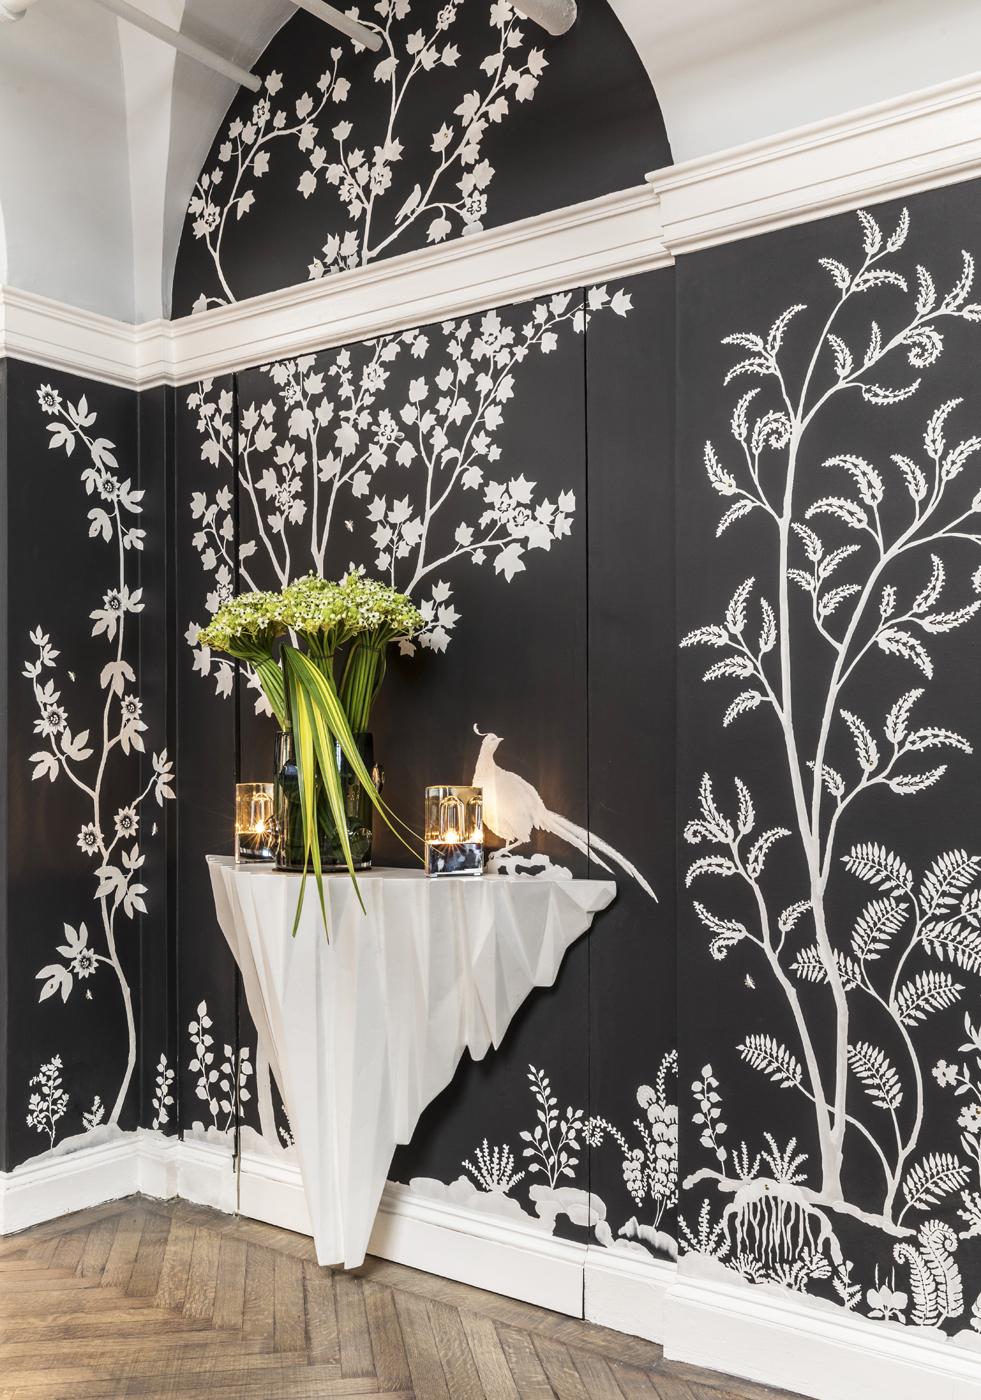 Plaster console table by artist Stephen Antonson set against modern chinoiserie custom MJ Atelier wallcovering | Savage Interior Design